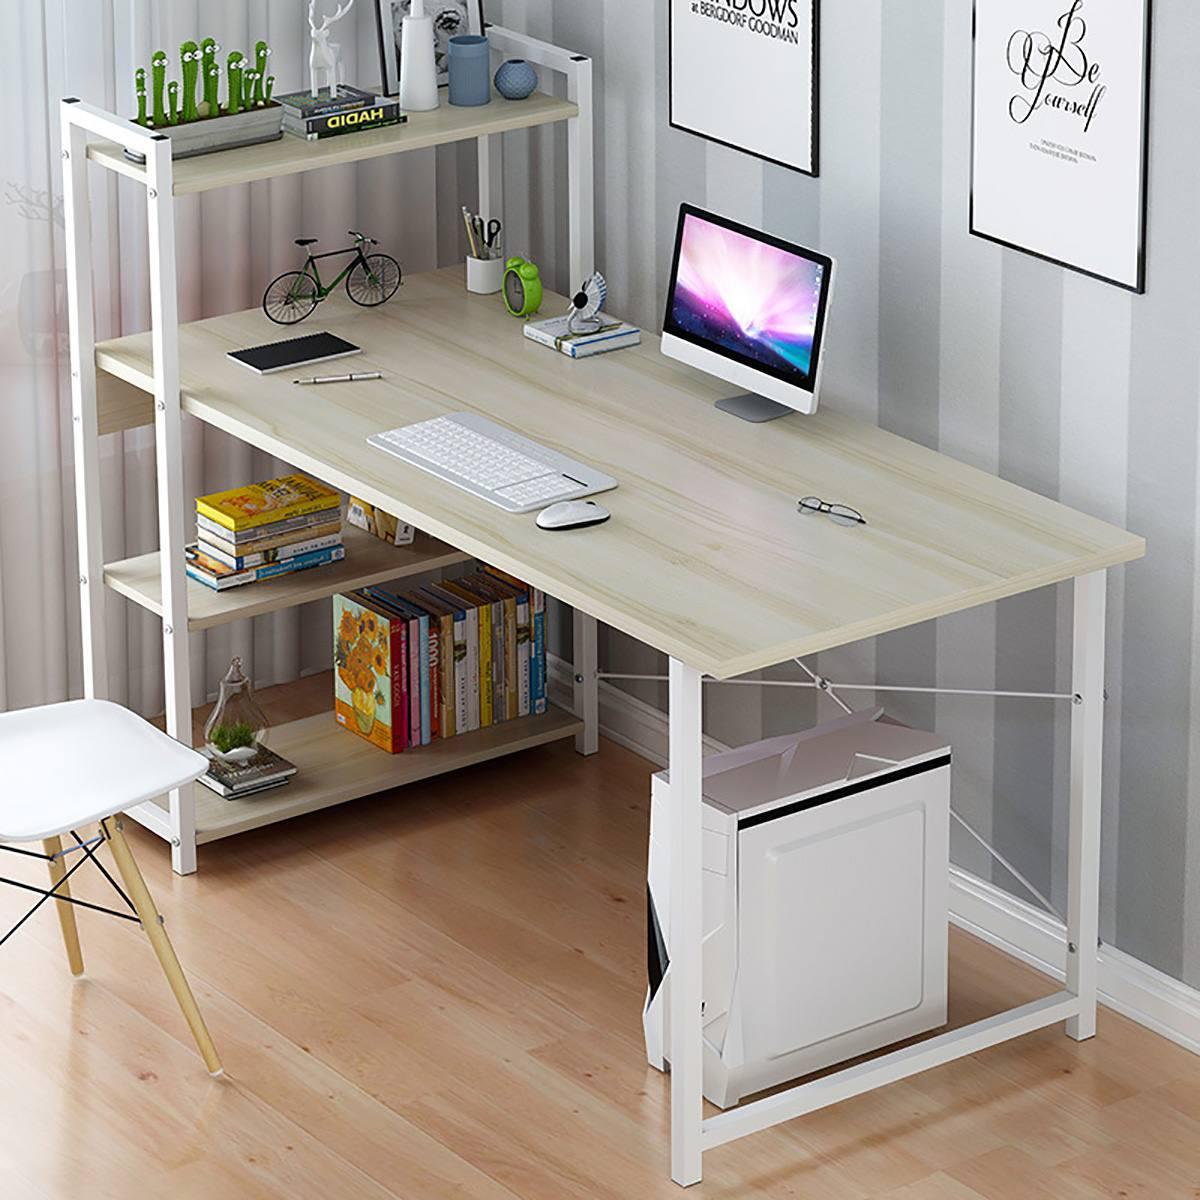 Hot Discount #ce6c - Computer Laptop Desk With Shelves Simple